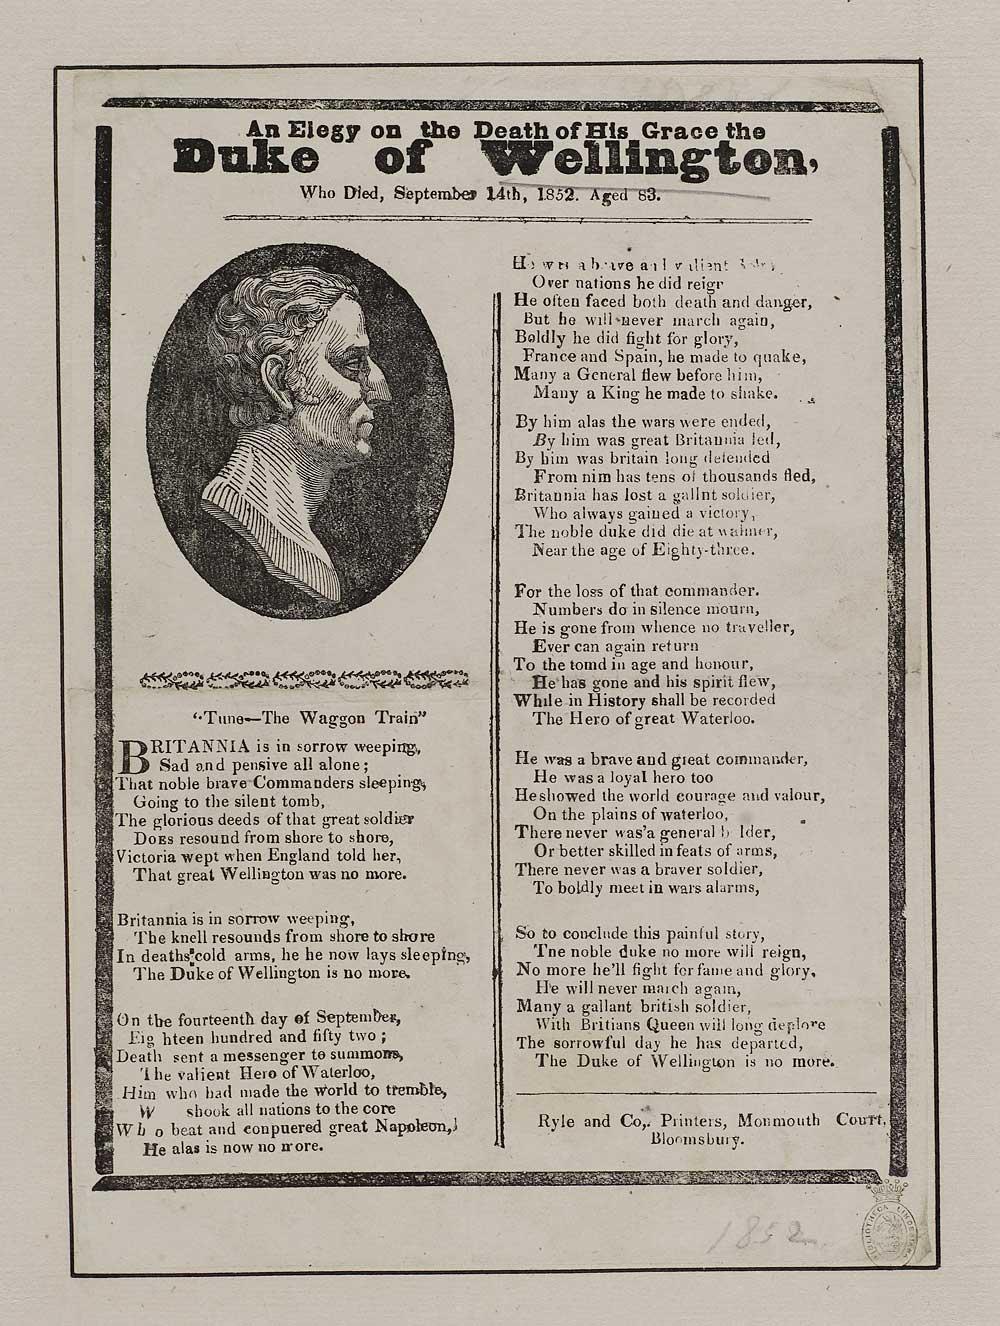 Elegy on the death of his Grace the Duke of Wellington